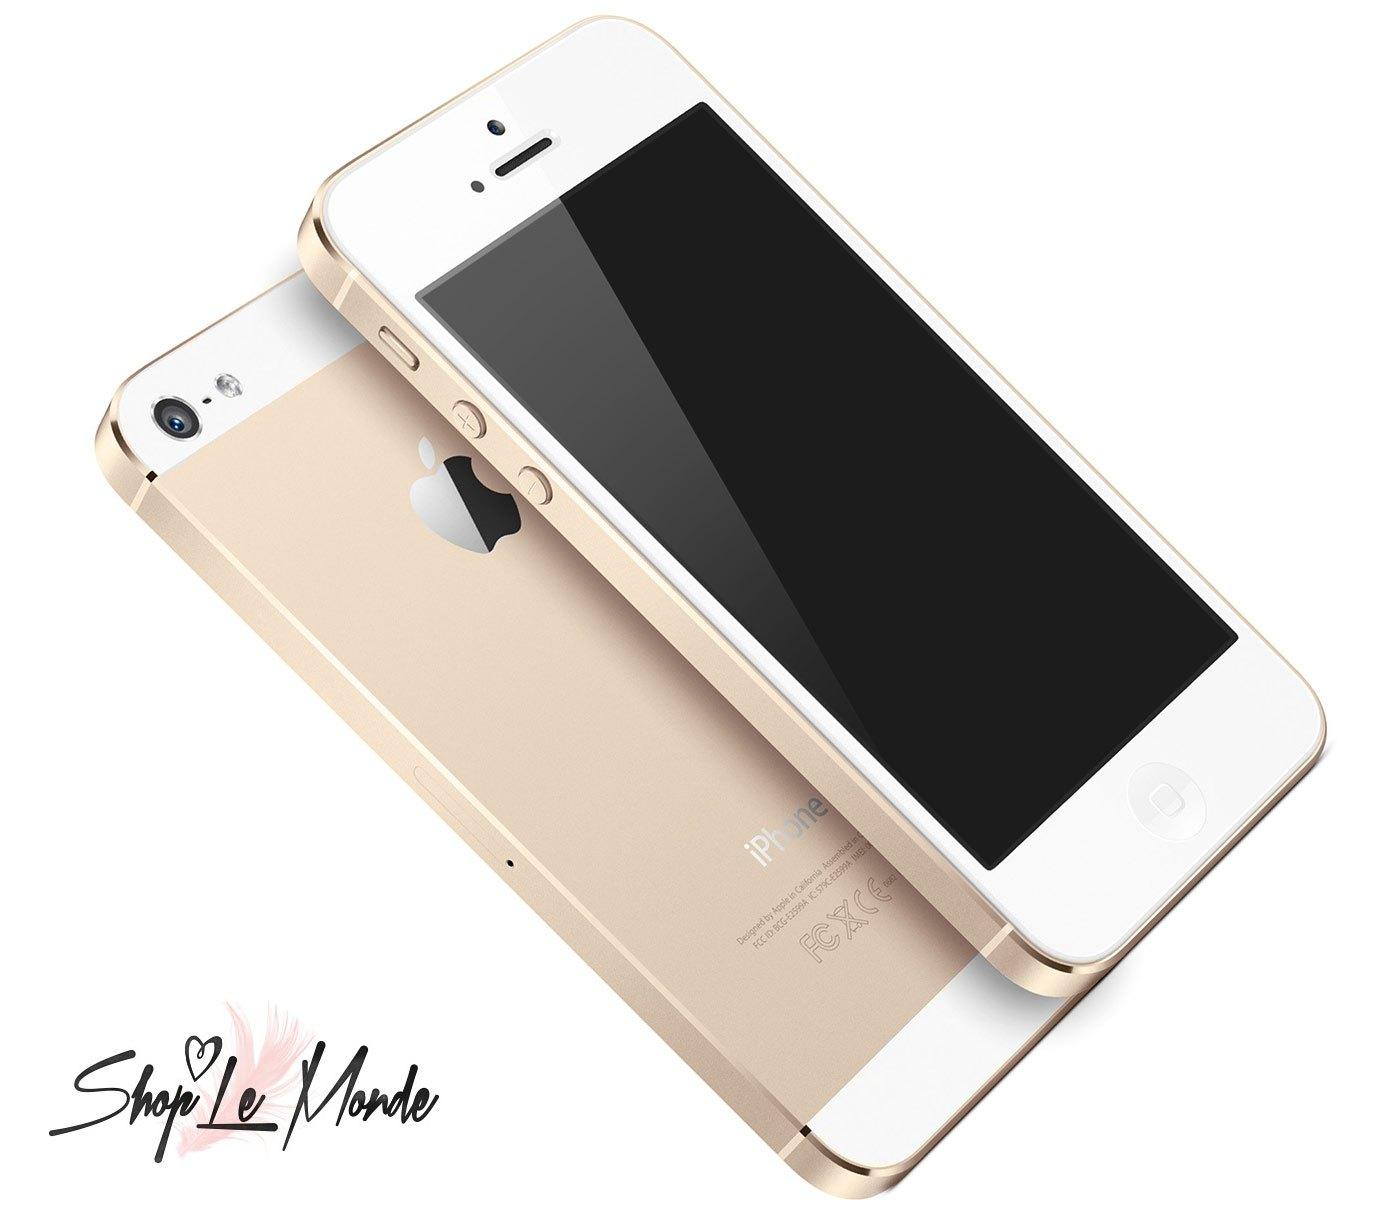 NTTドコモ、AppleのiPhoneの新機種を販売へ=各社報道による